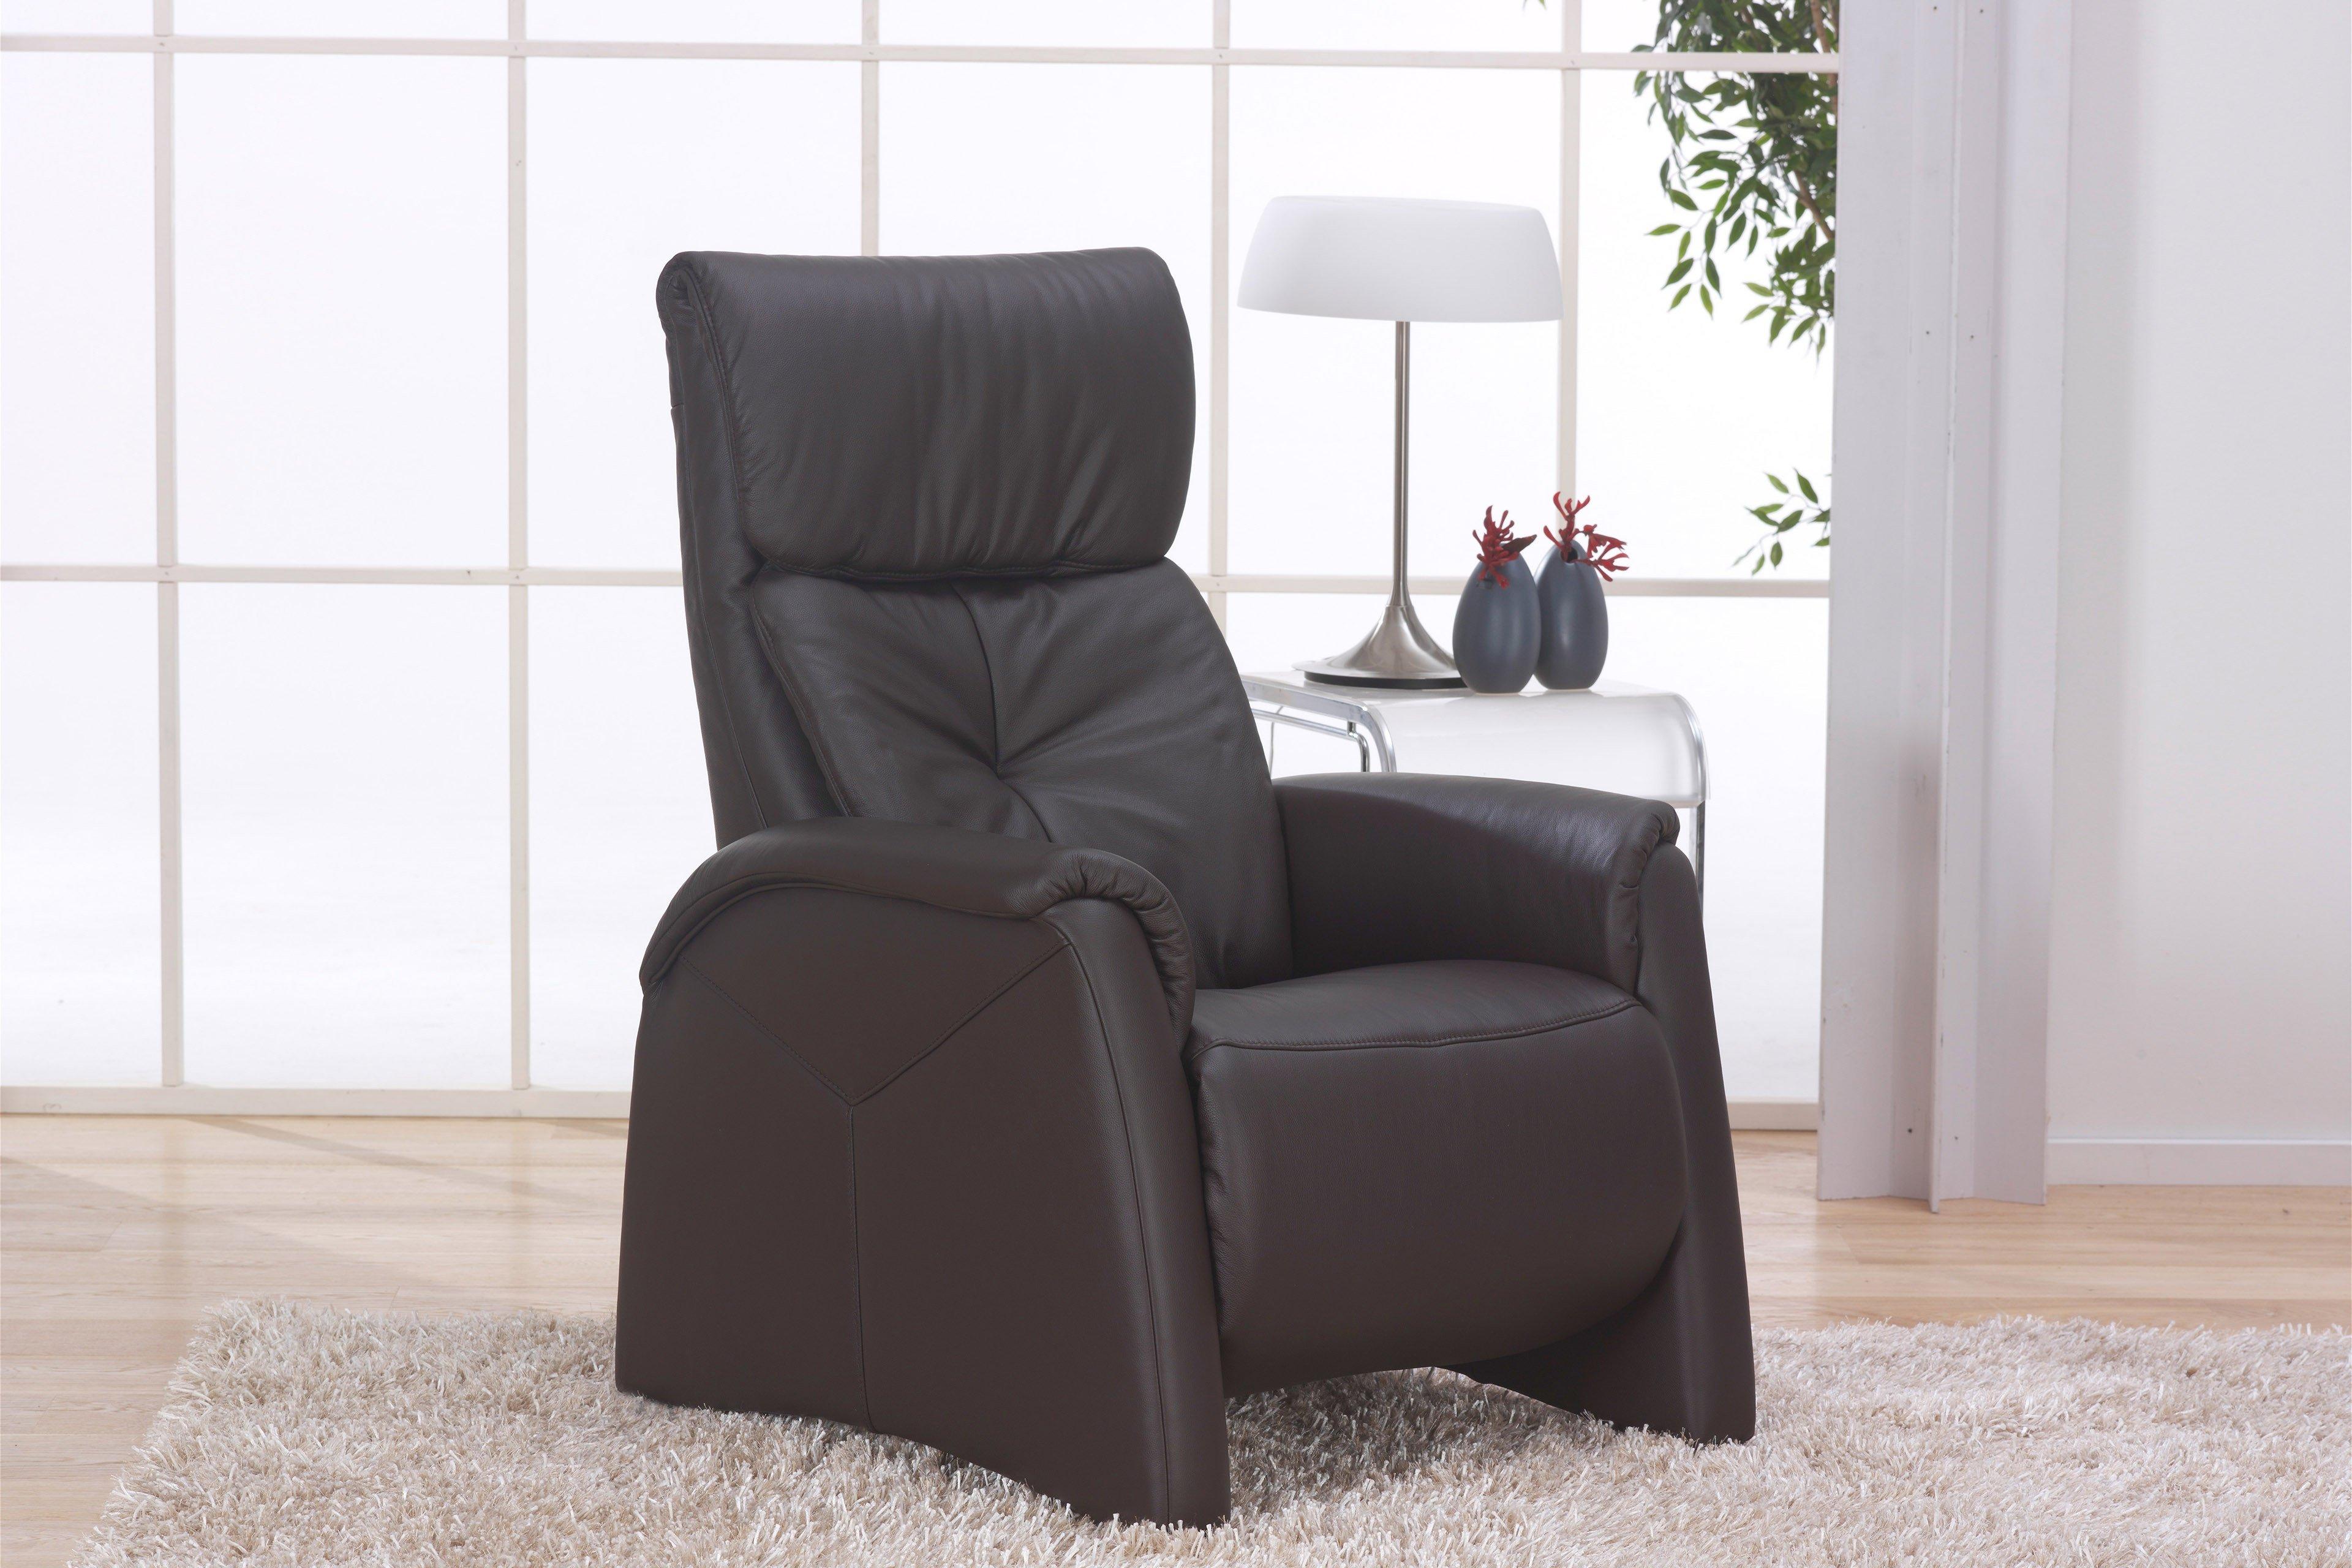 relaxsessel himolla himolla longlife leder sessel cumulus. Black Bedroom Furniture Sets. Home Design Ideas